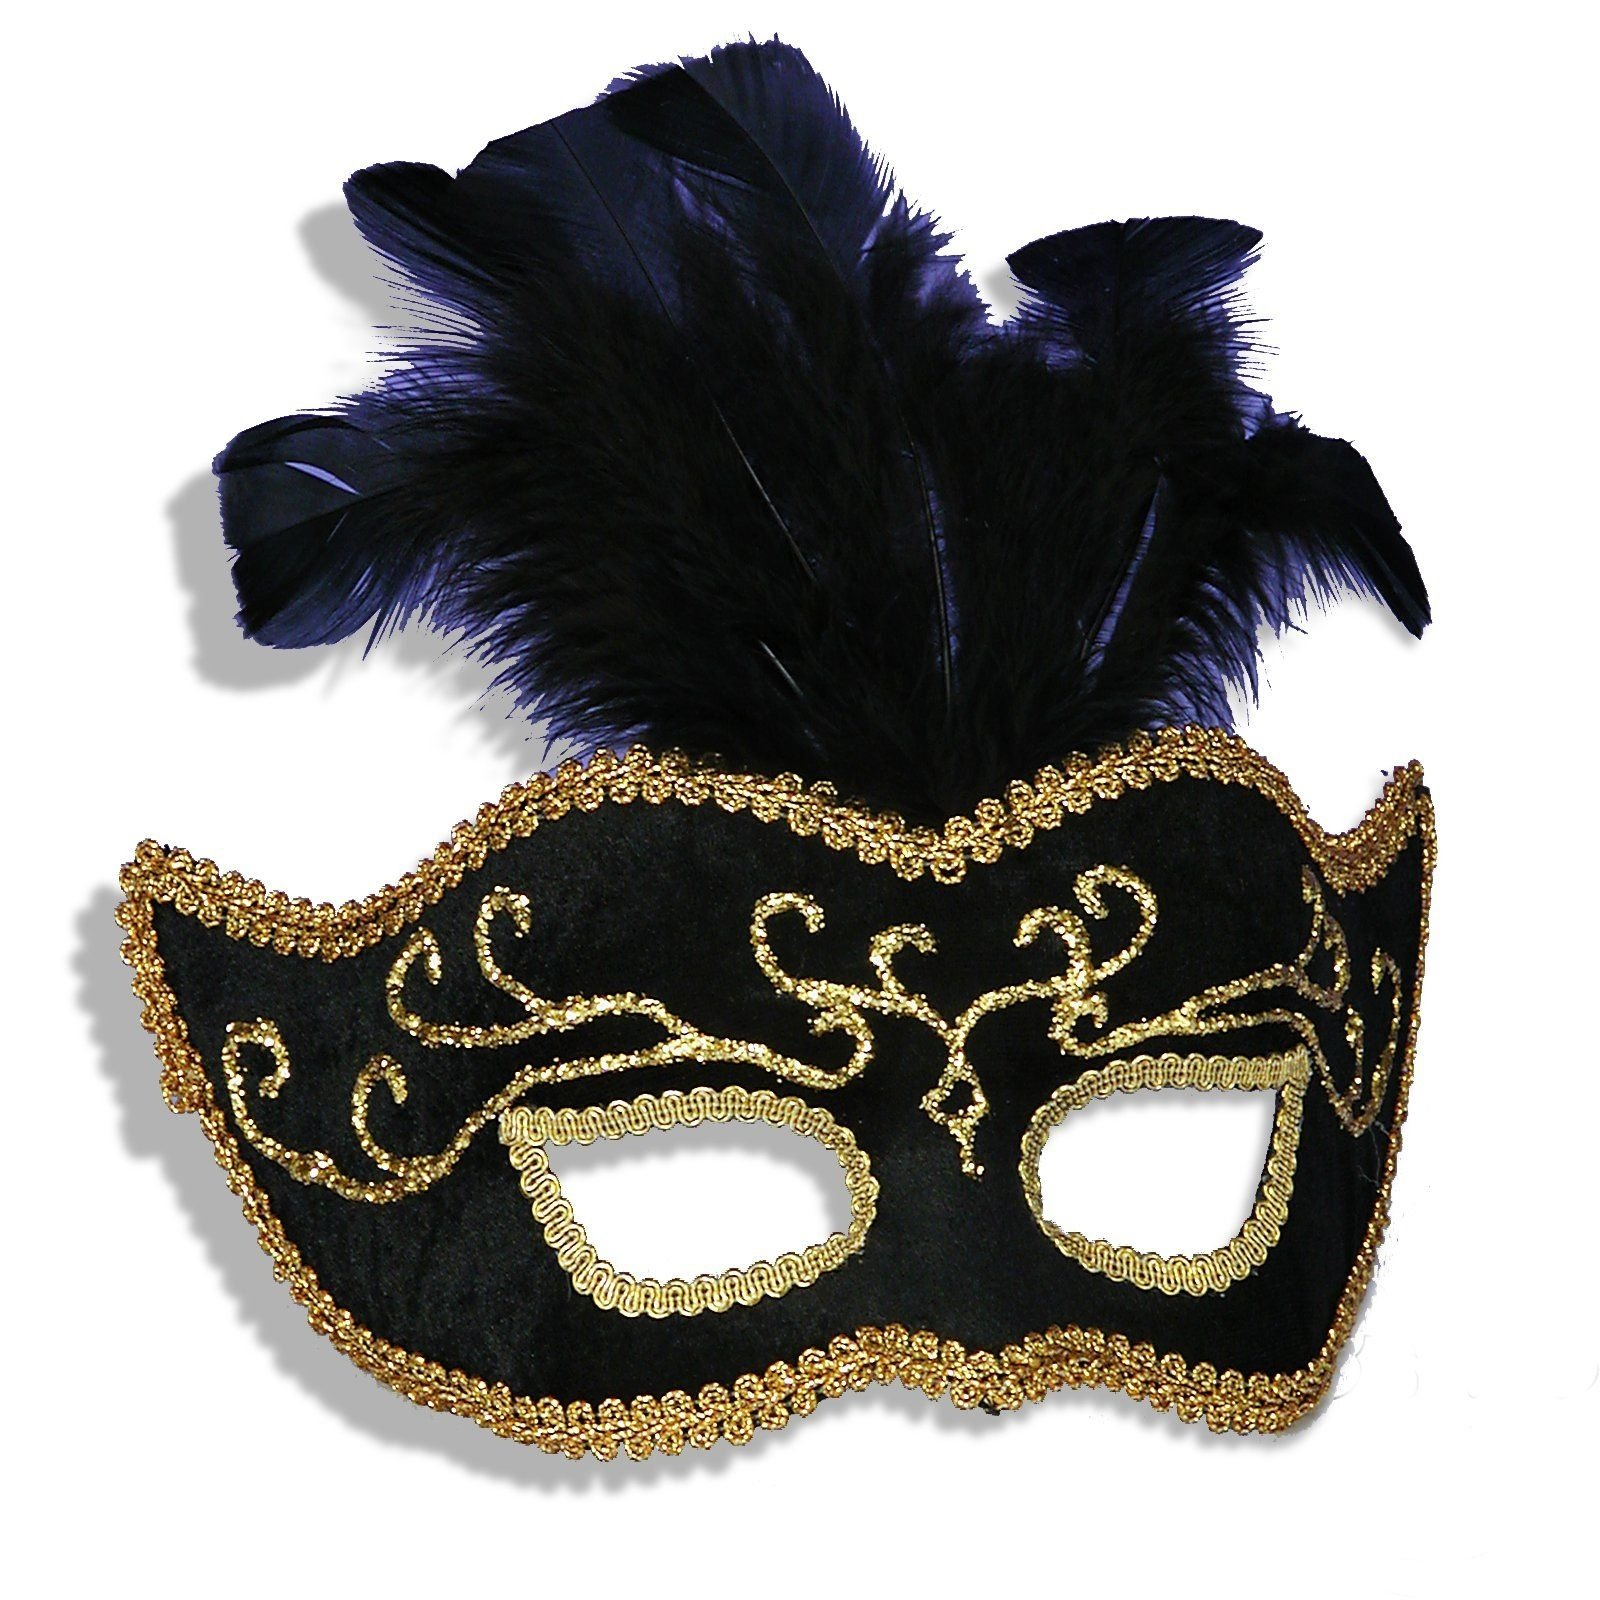 masquerades masks made with plastic | masquerade masks, masquerades